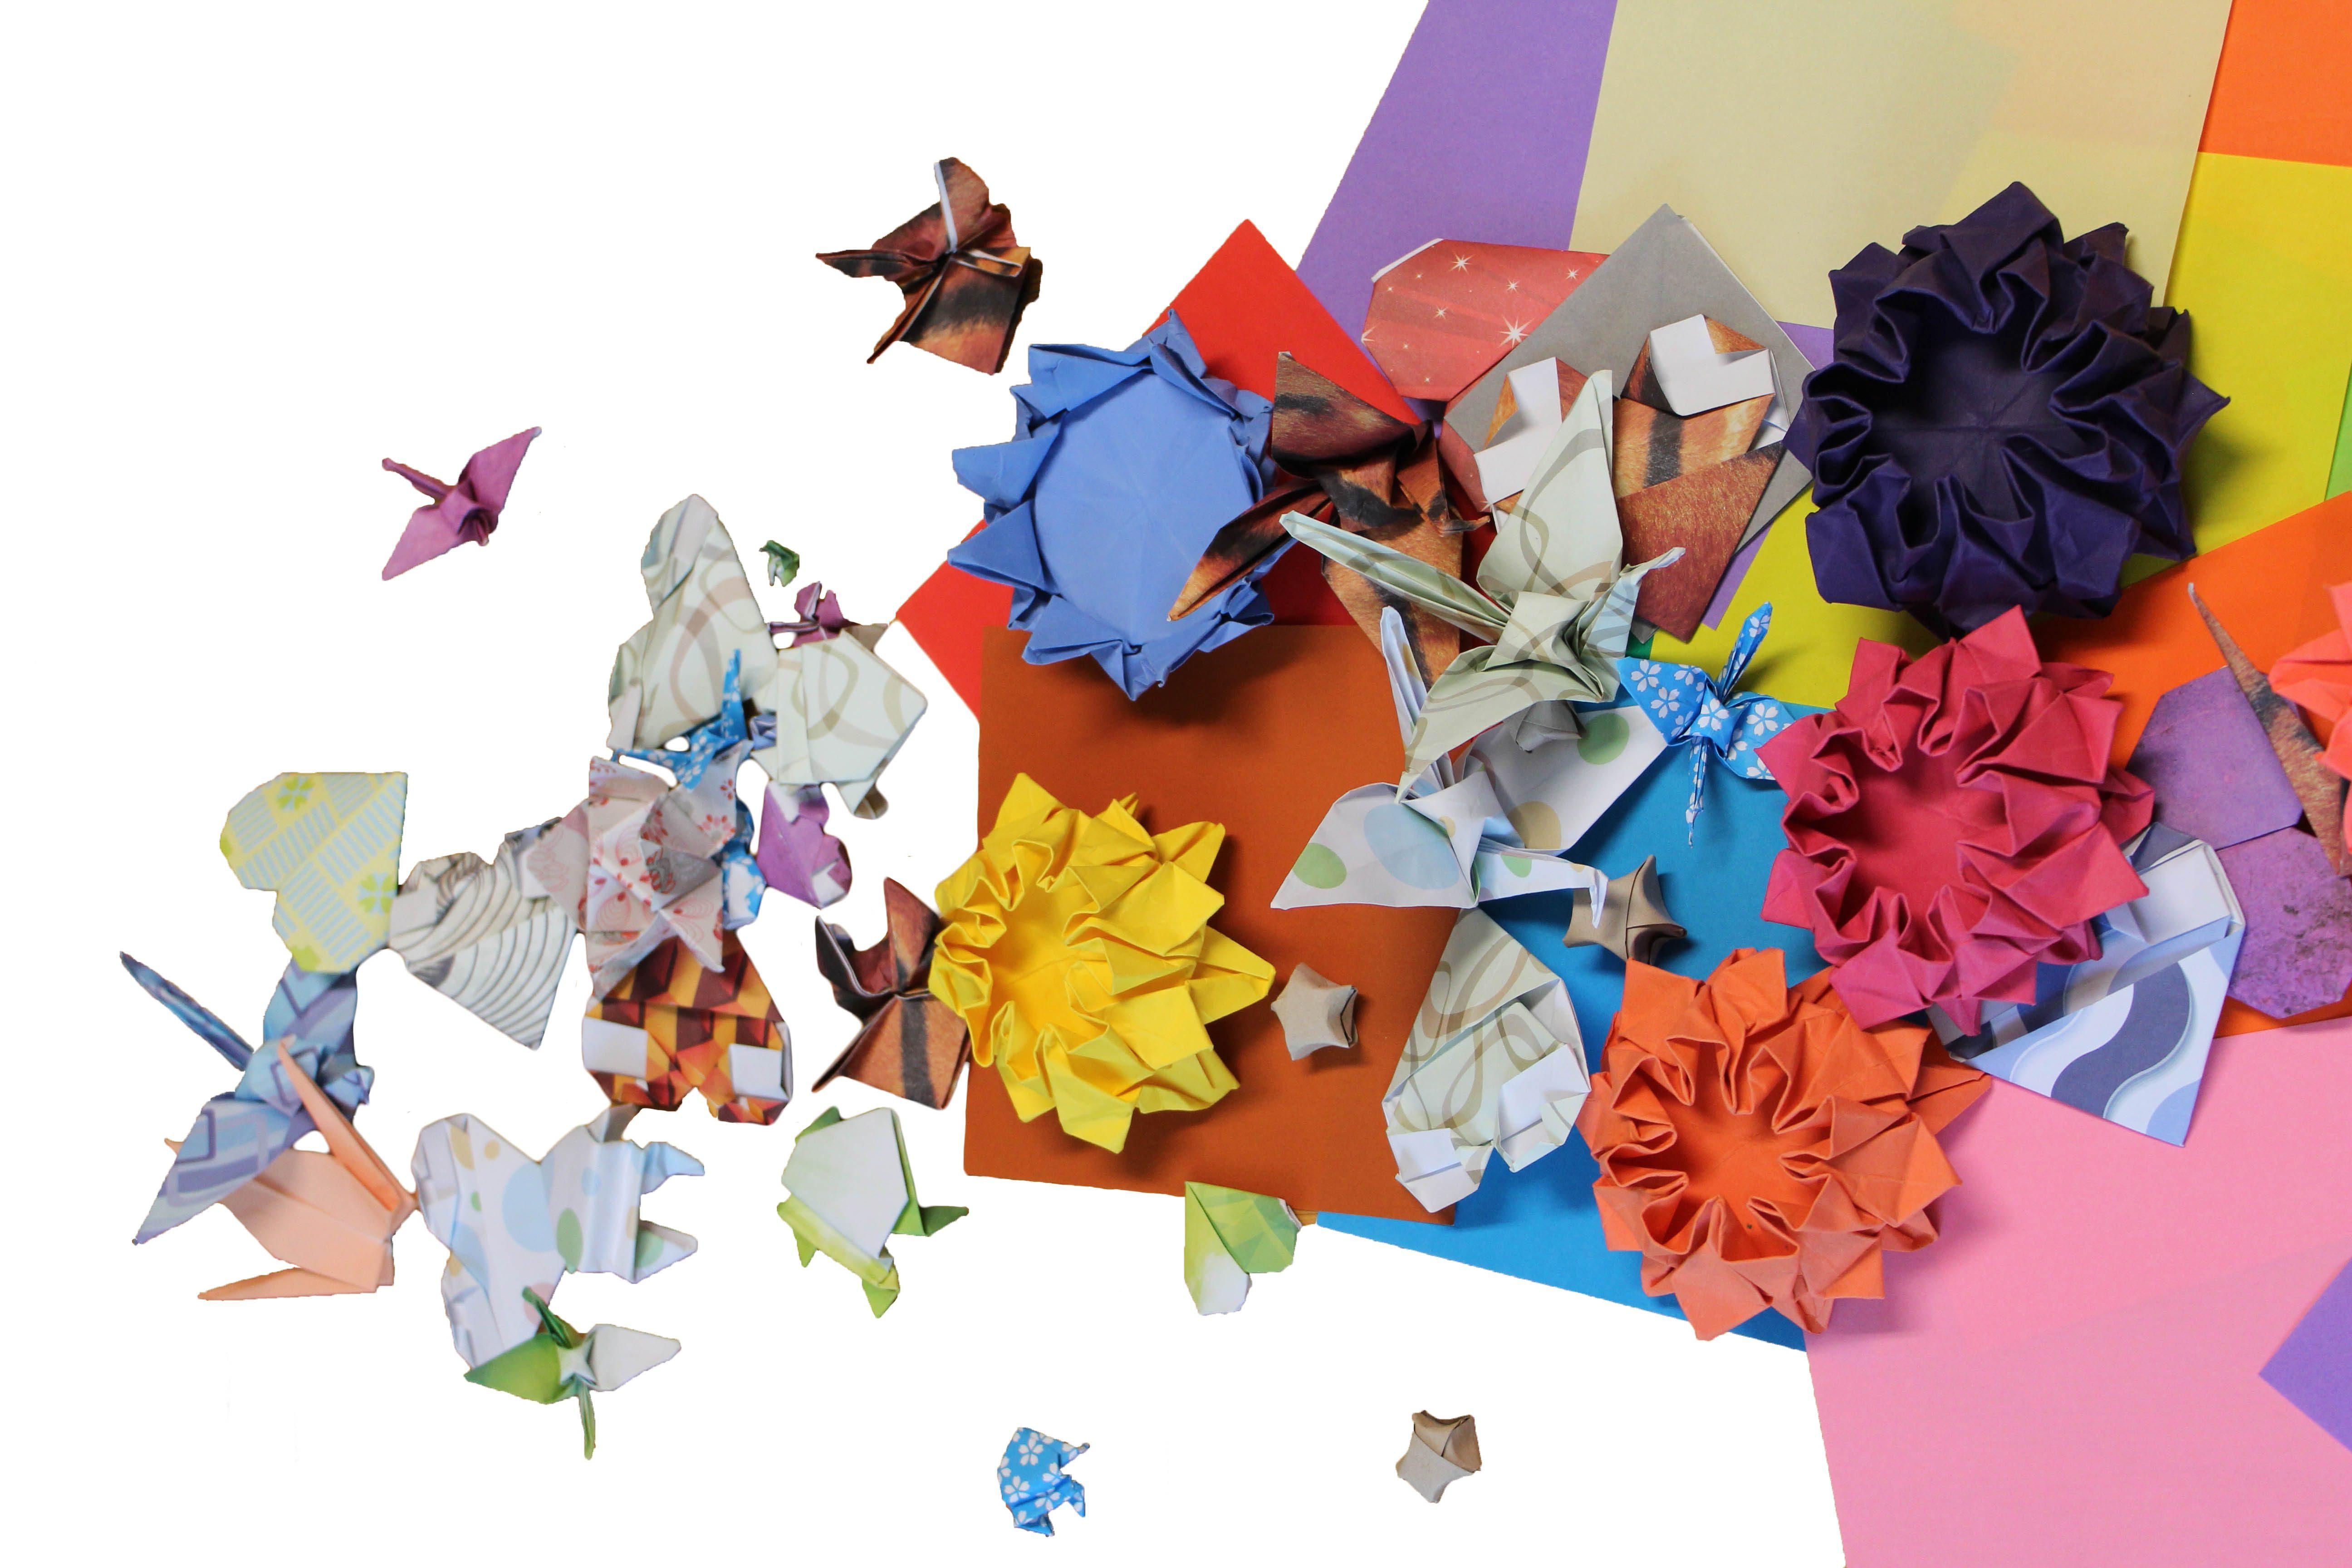 crumbling-origami-72dpi